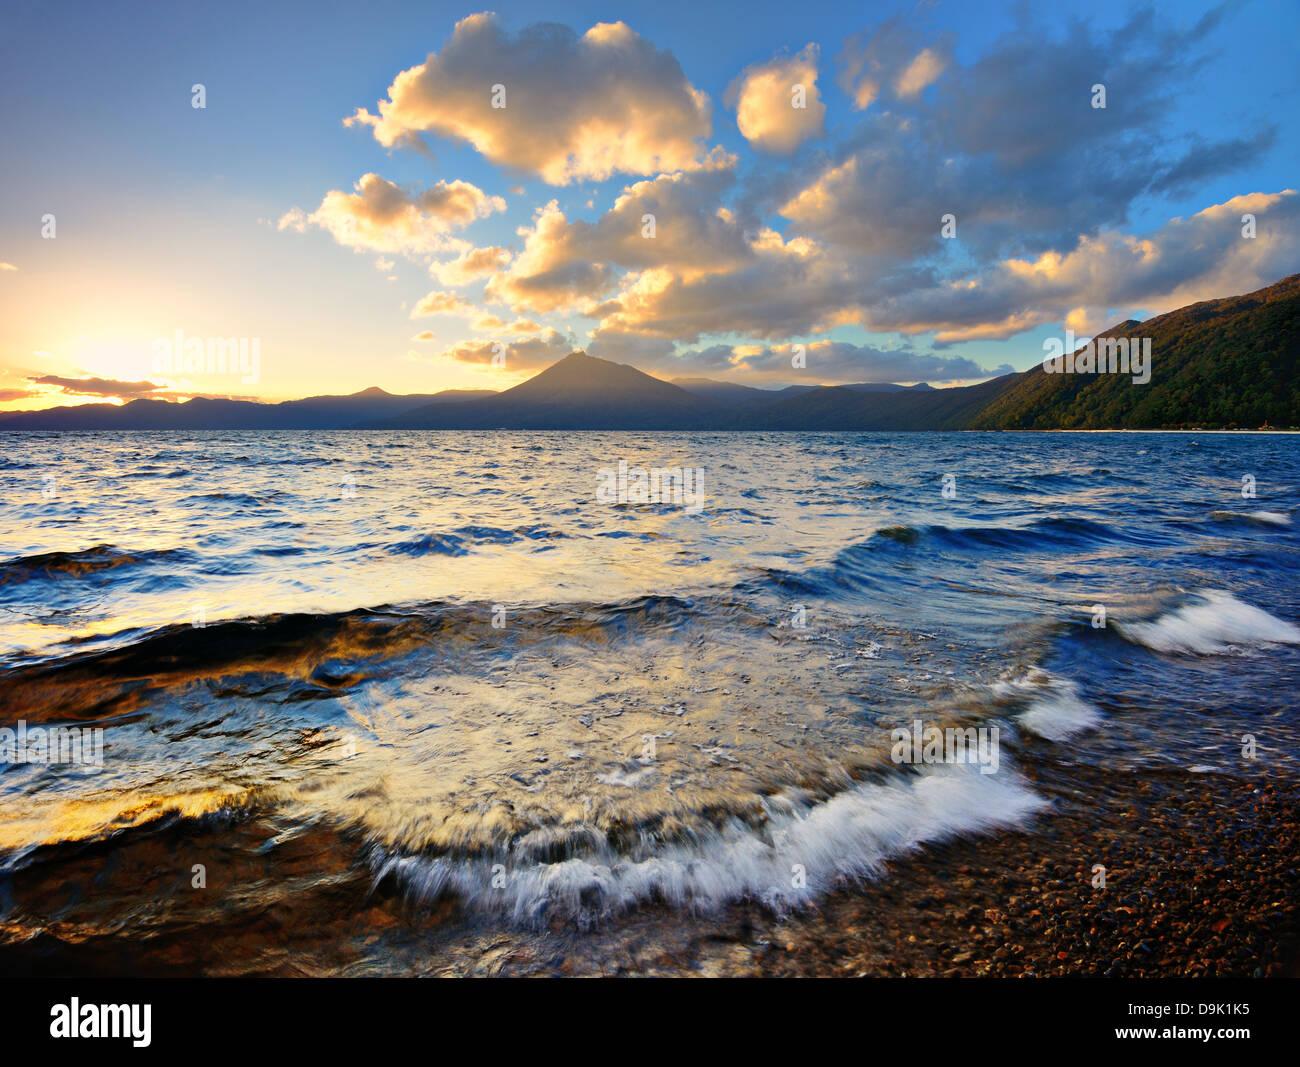 Shikotsu Lake au coucher du soleil à Hokkaido, au Japon. Photo Stock